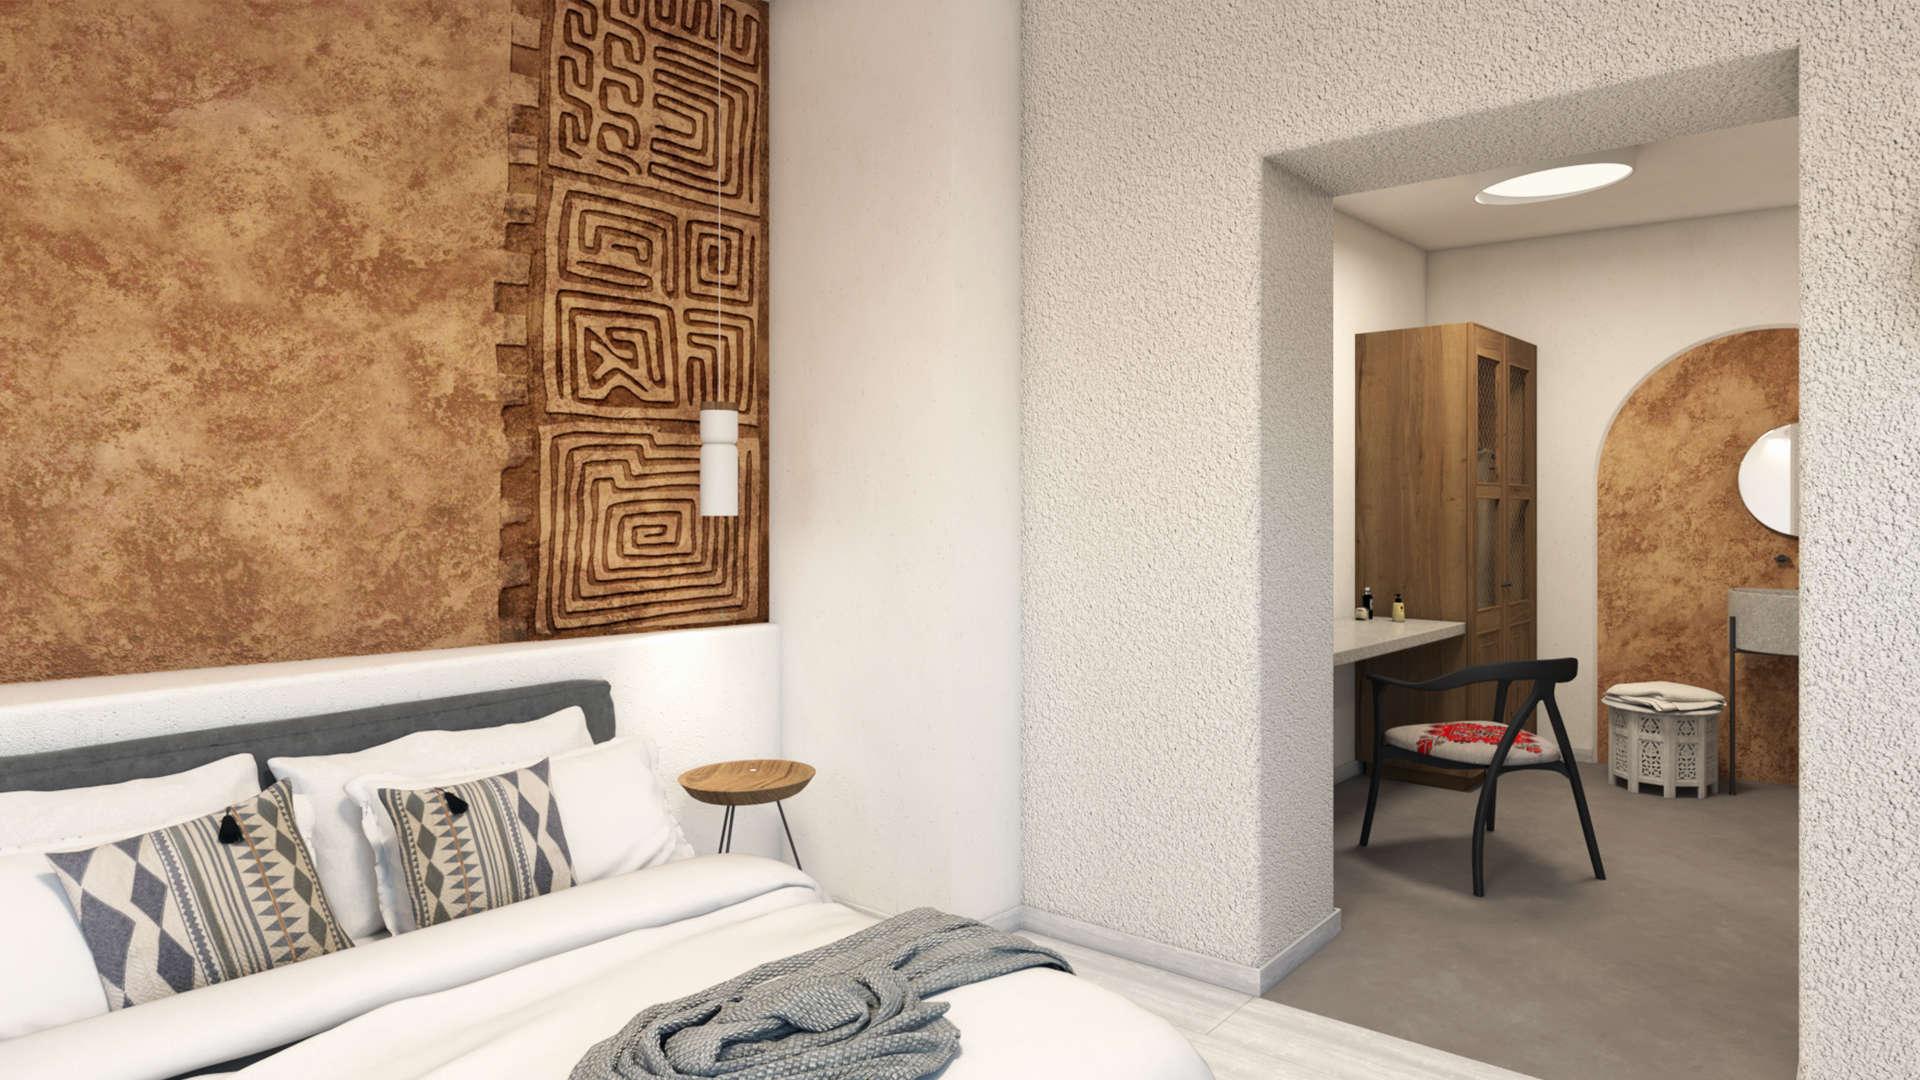 Hotel in a village,suite, interior design, bed, bathroom ante room. Τουριστικό κατάλυμα σε οικισμό, σουίτα, κραβατοκάμαρα και προθάλαμος μπάνιου.